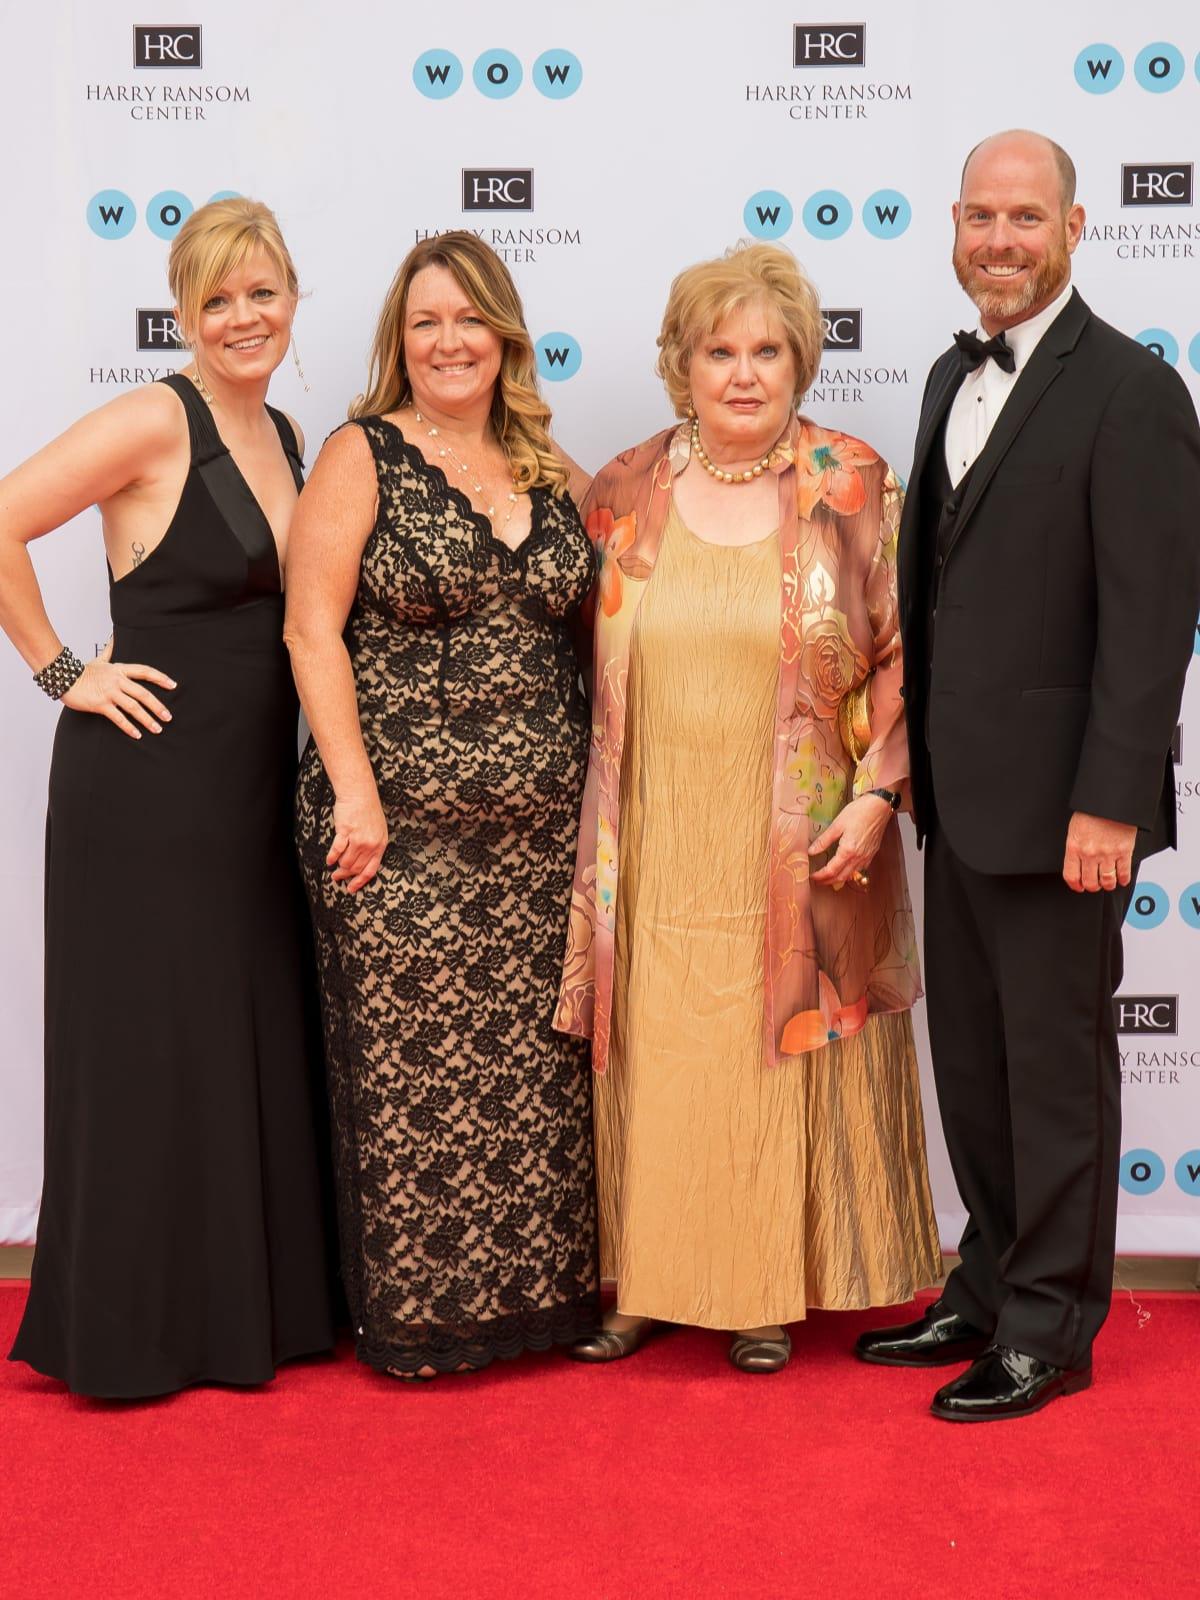 Ransom Center World of Wonders Gala 2017 Julie Hight Liz Losada Margaret Hight Phil Hight